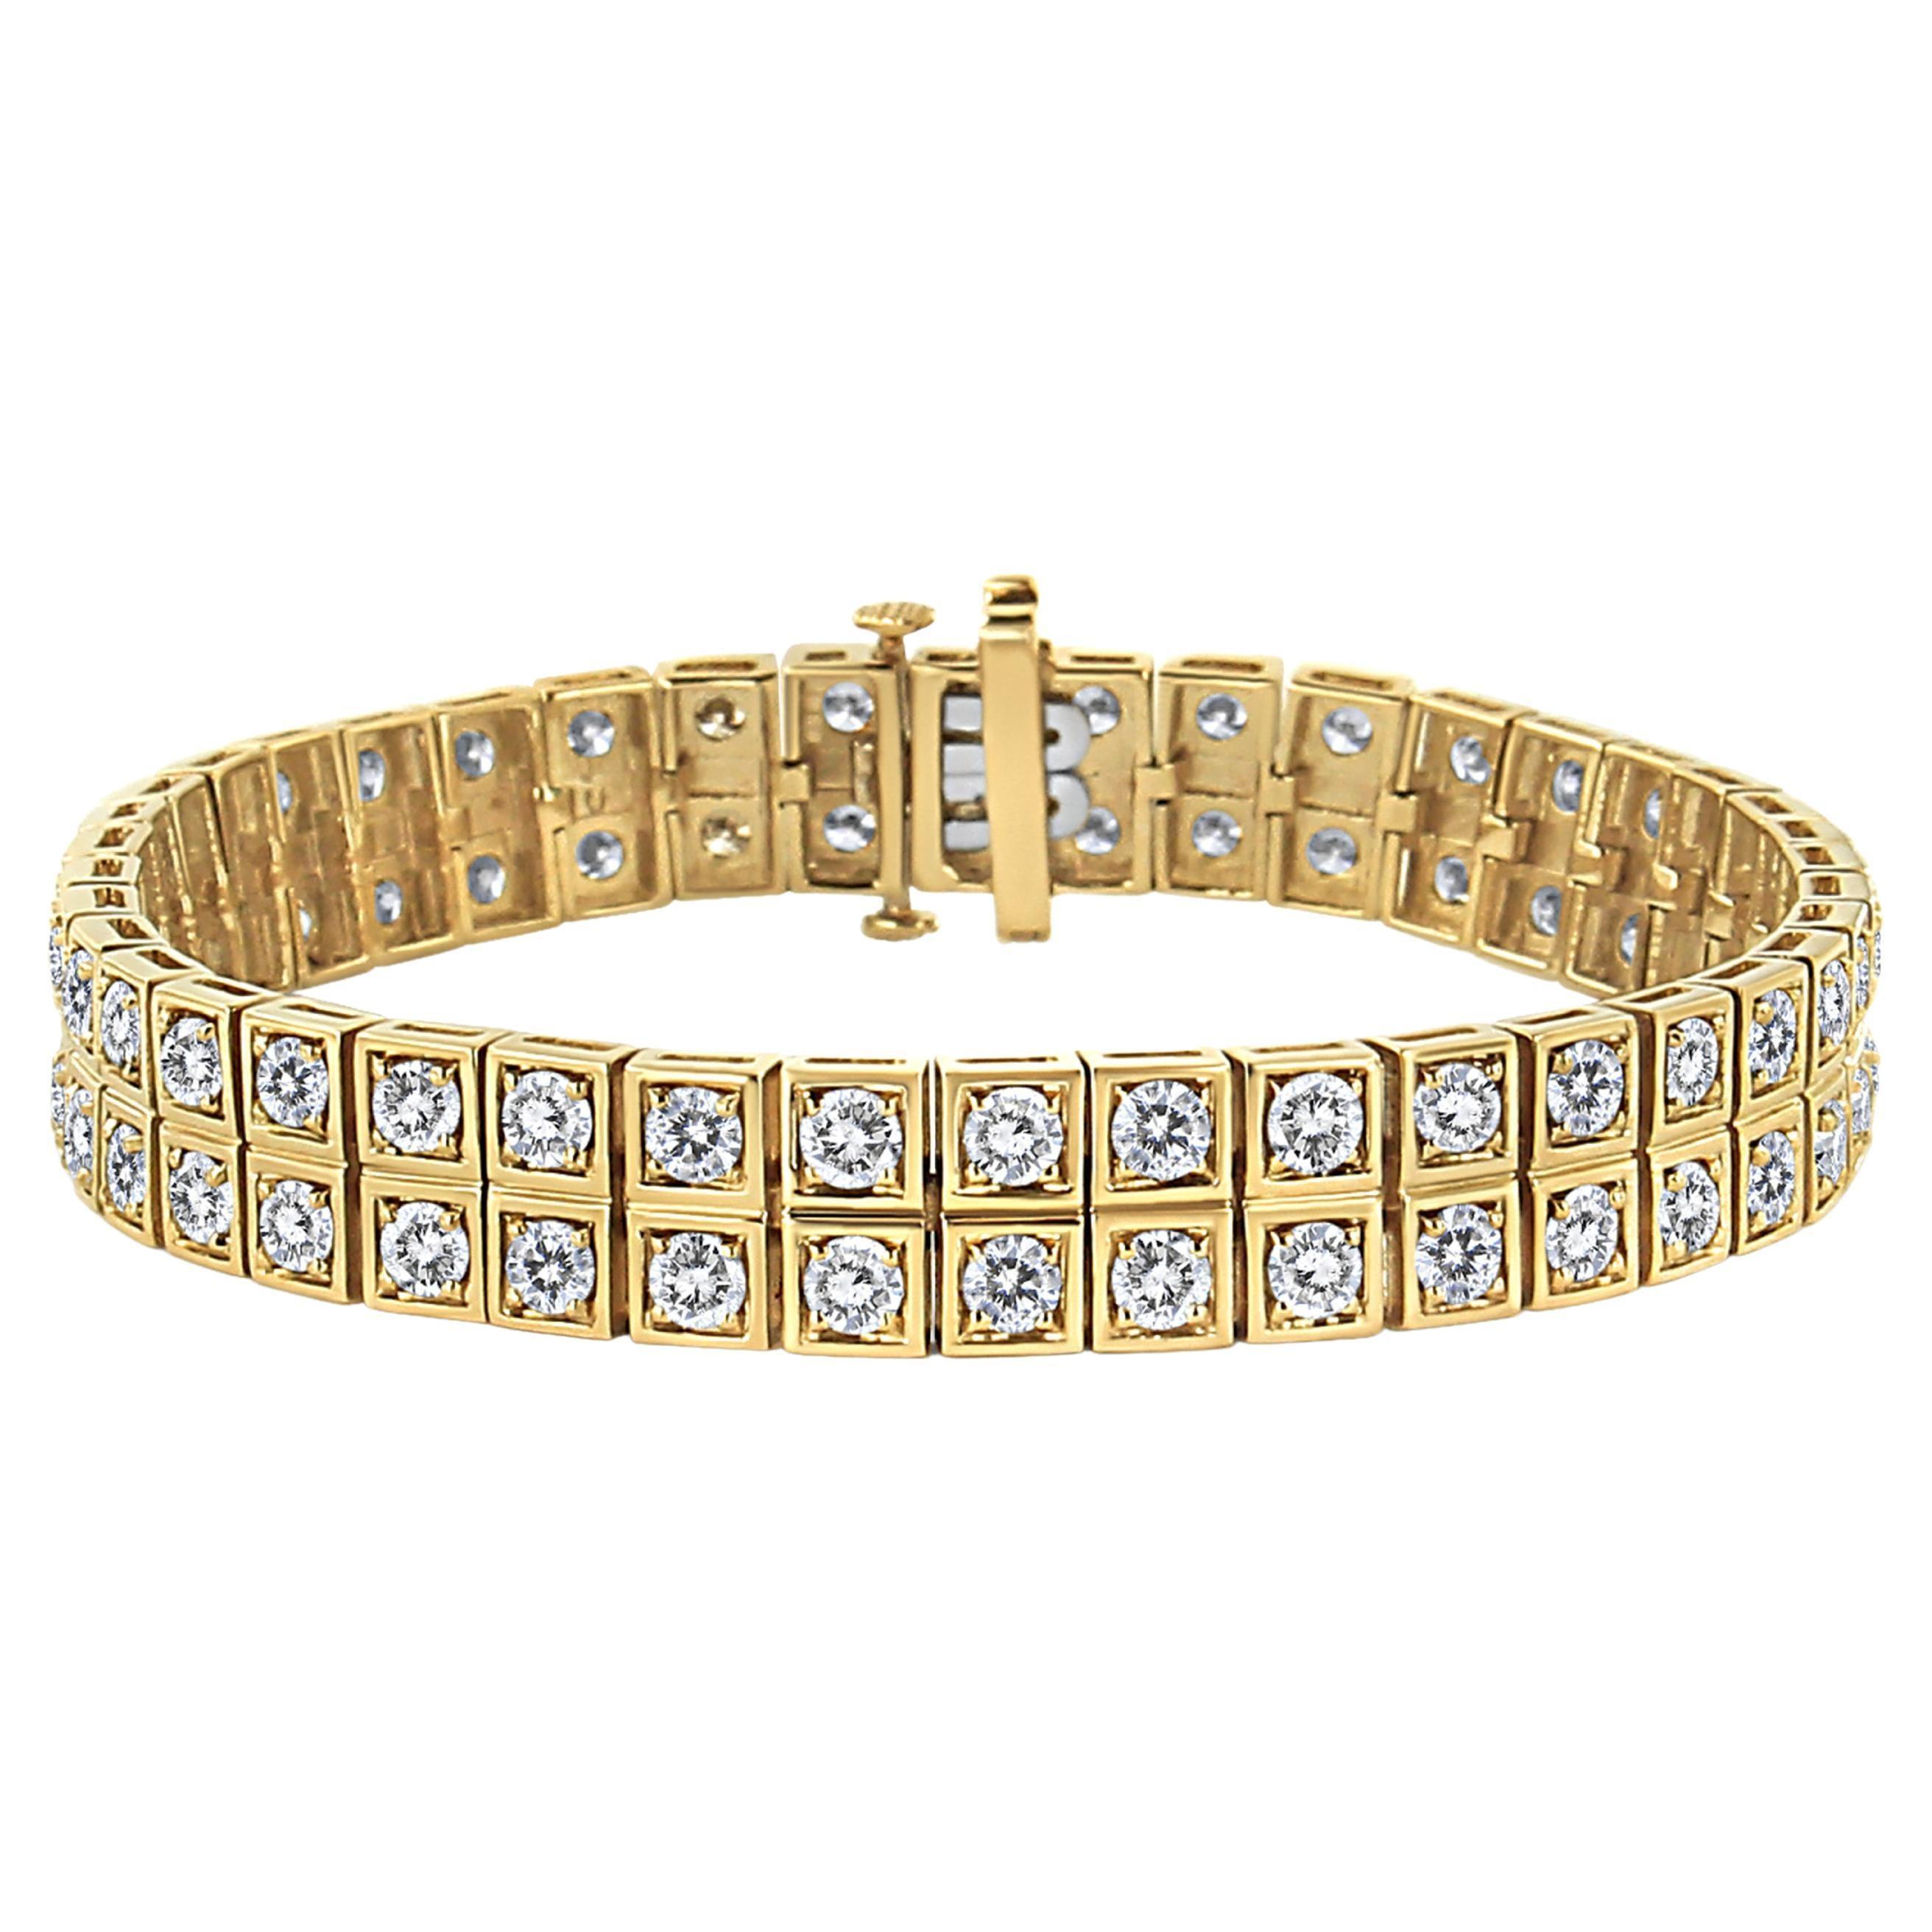 10K Yellow Gold 8.00 Carat Round-Cut Diamond Two Row Square Link Tennis Bracelet